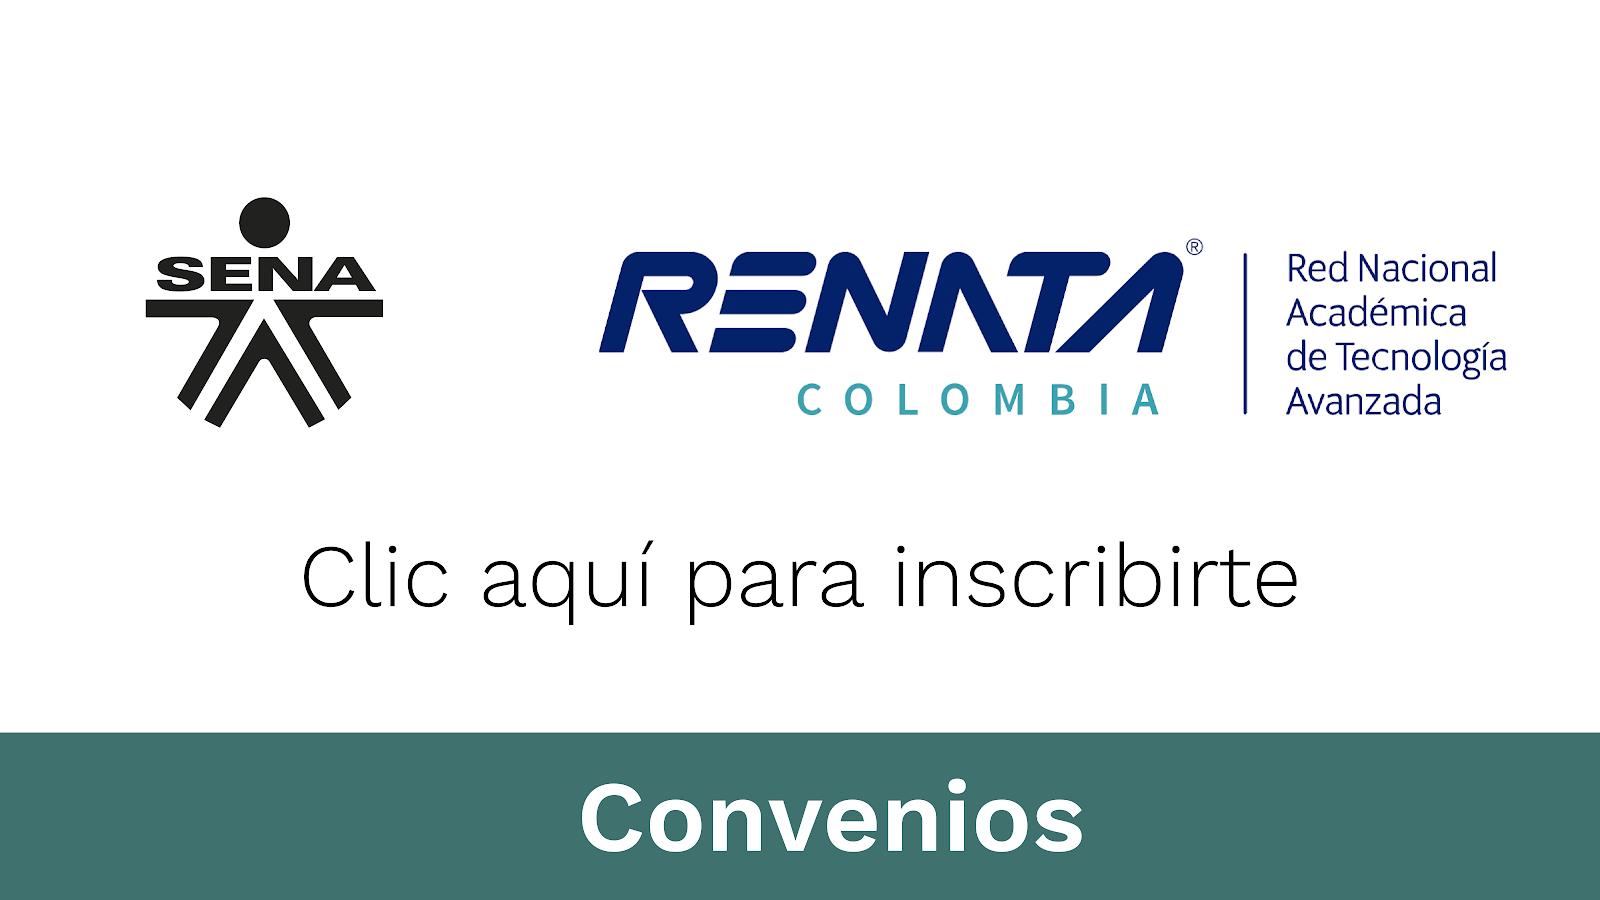 Alianza SENA - RENATA